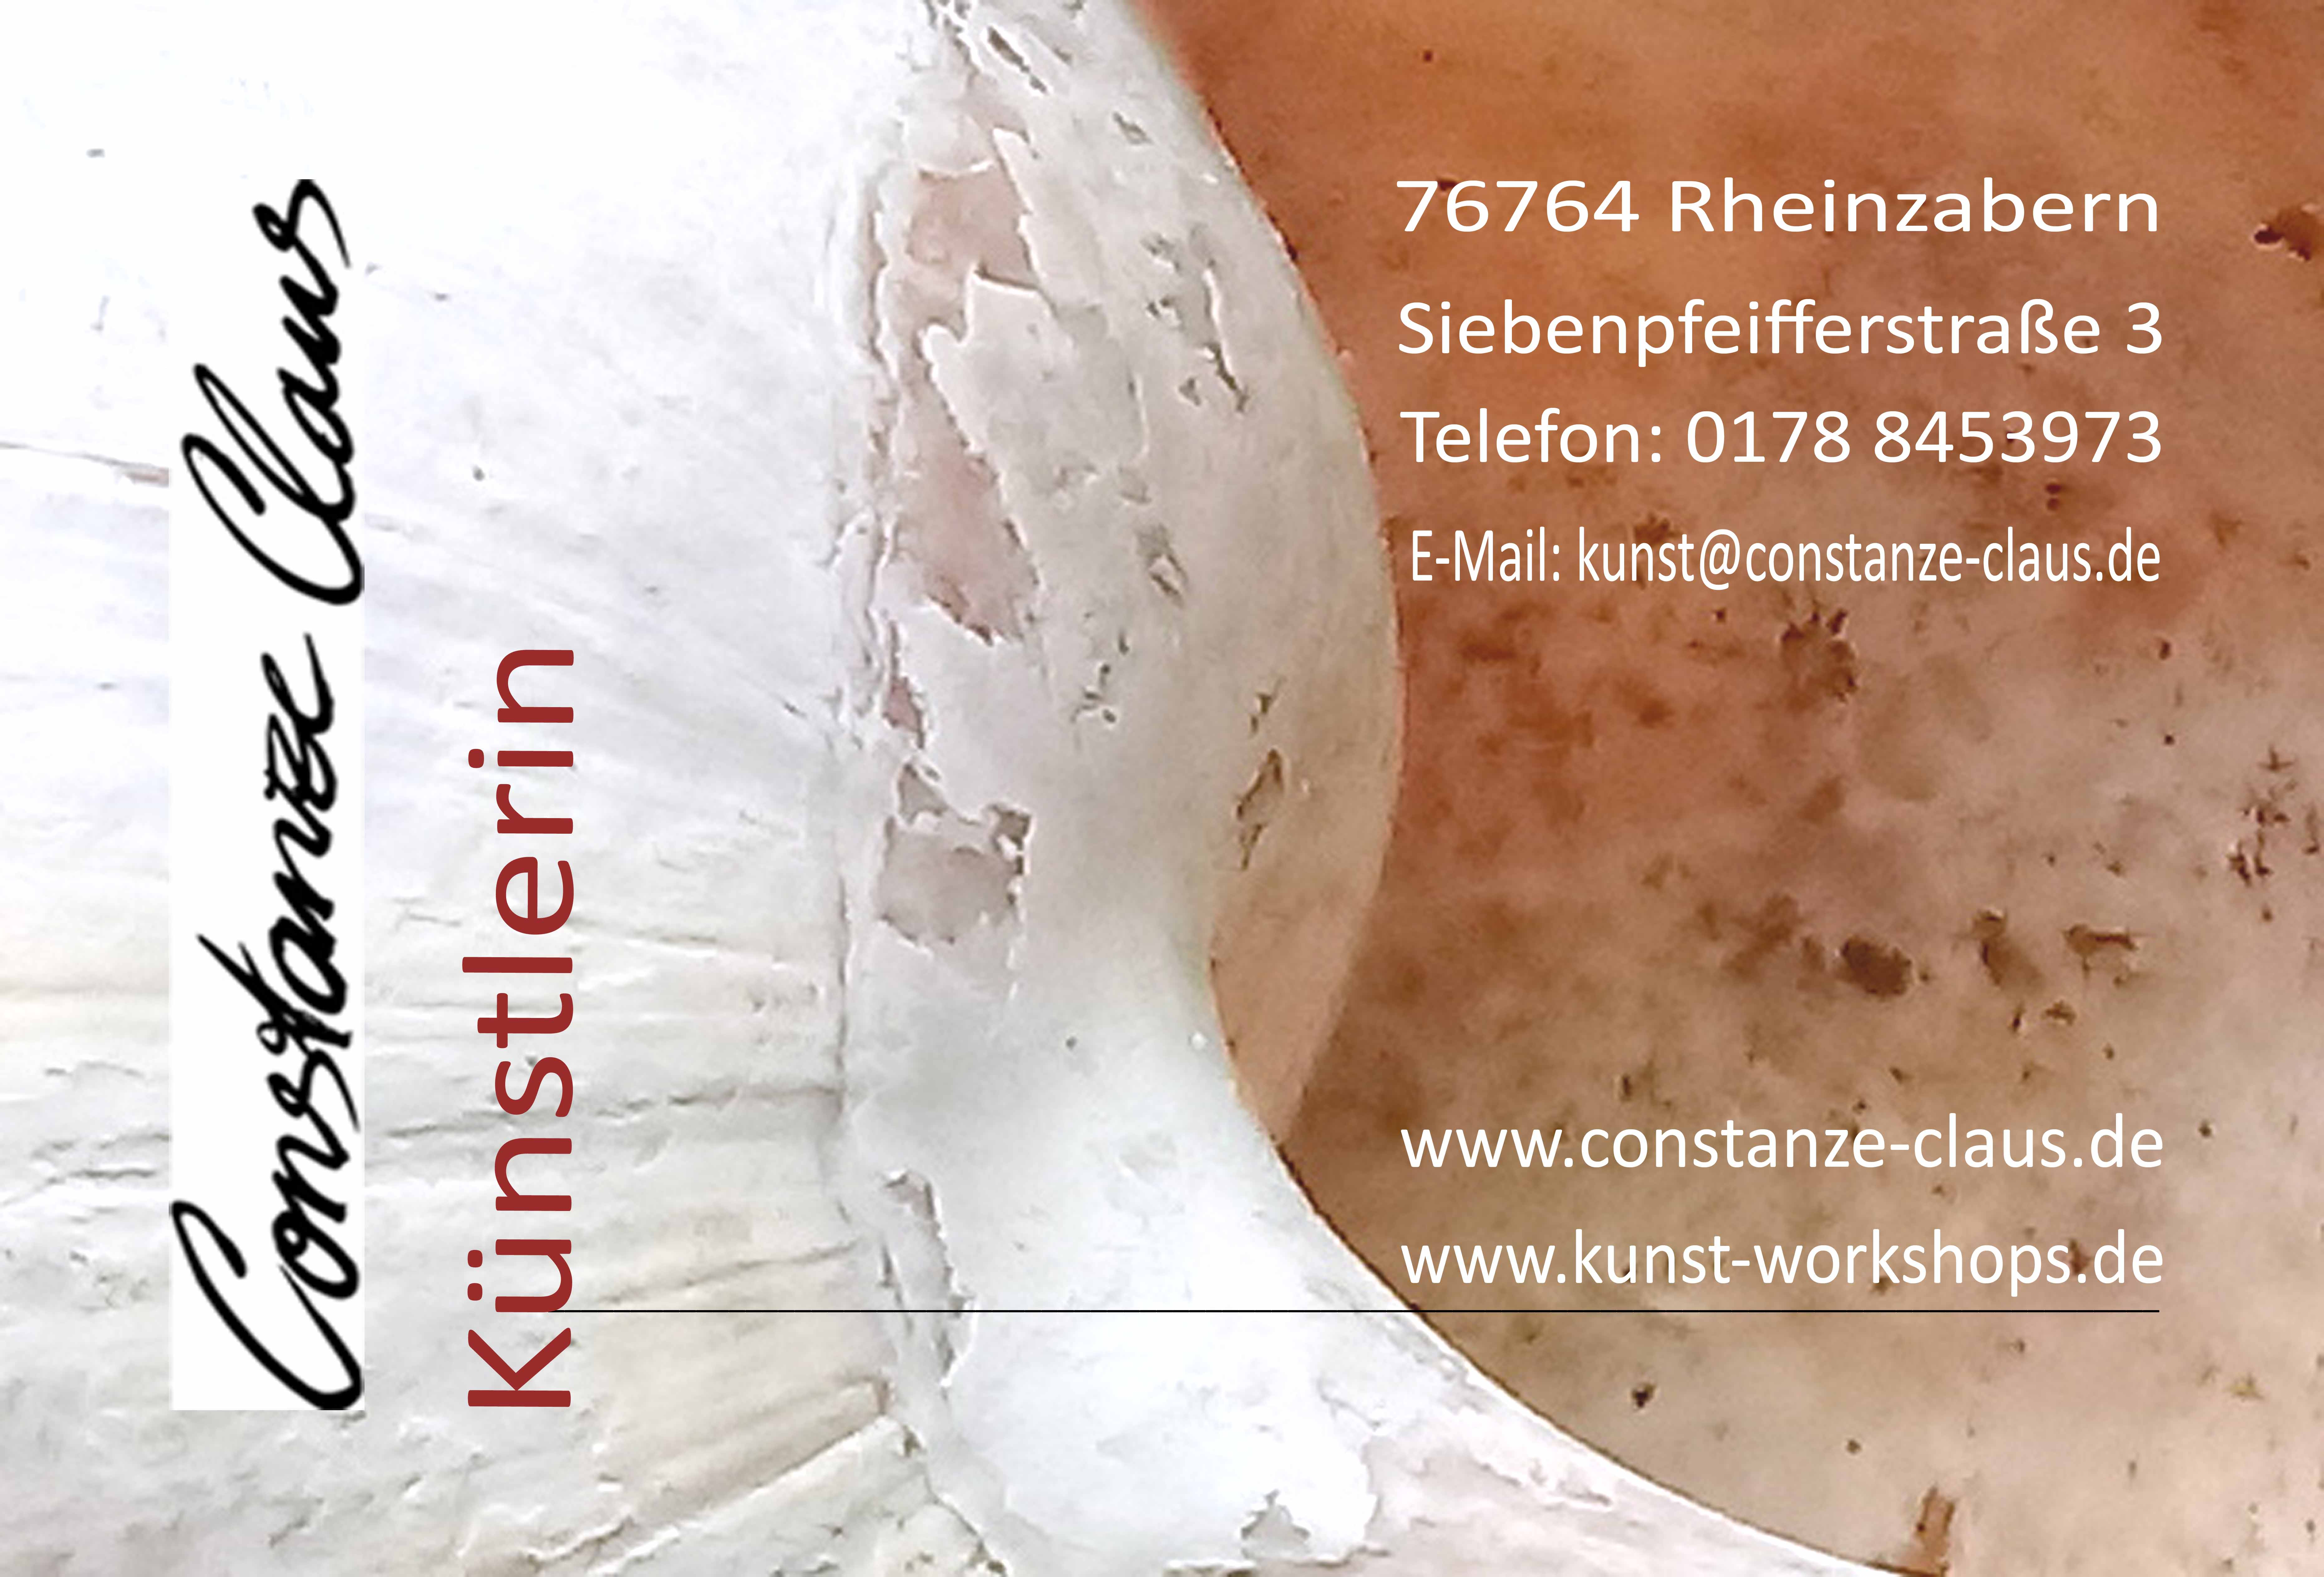 Beste Echtheitszertifikat Kunst Fotos - zertifizierungsstelle ...